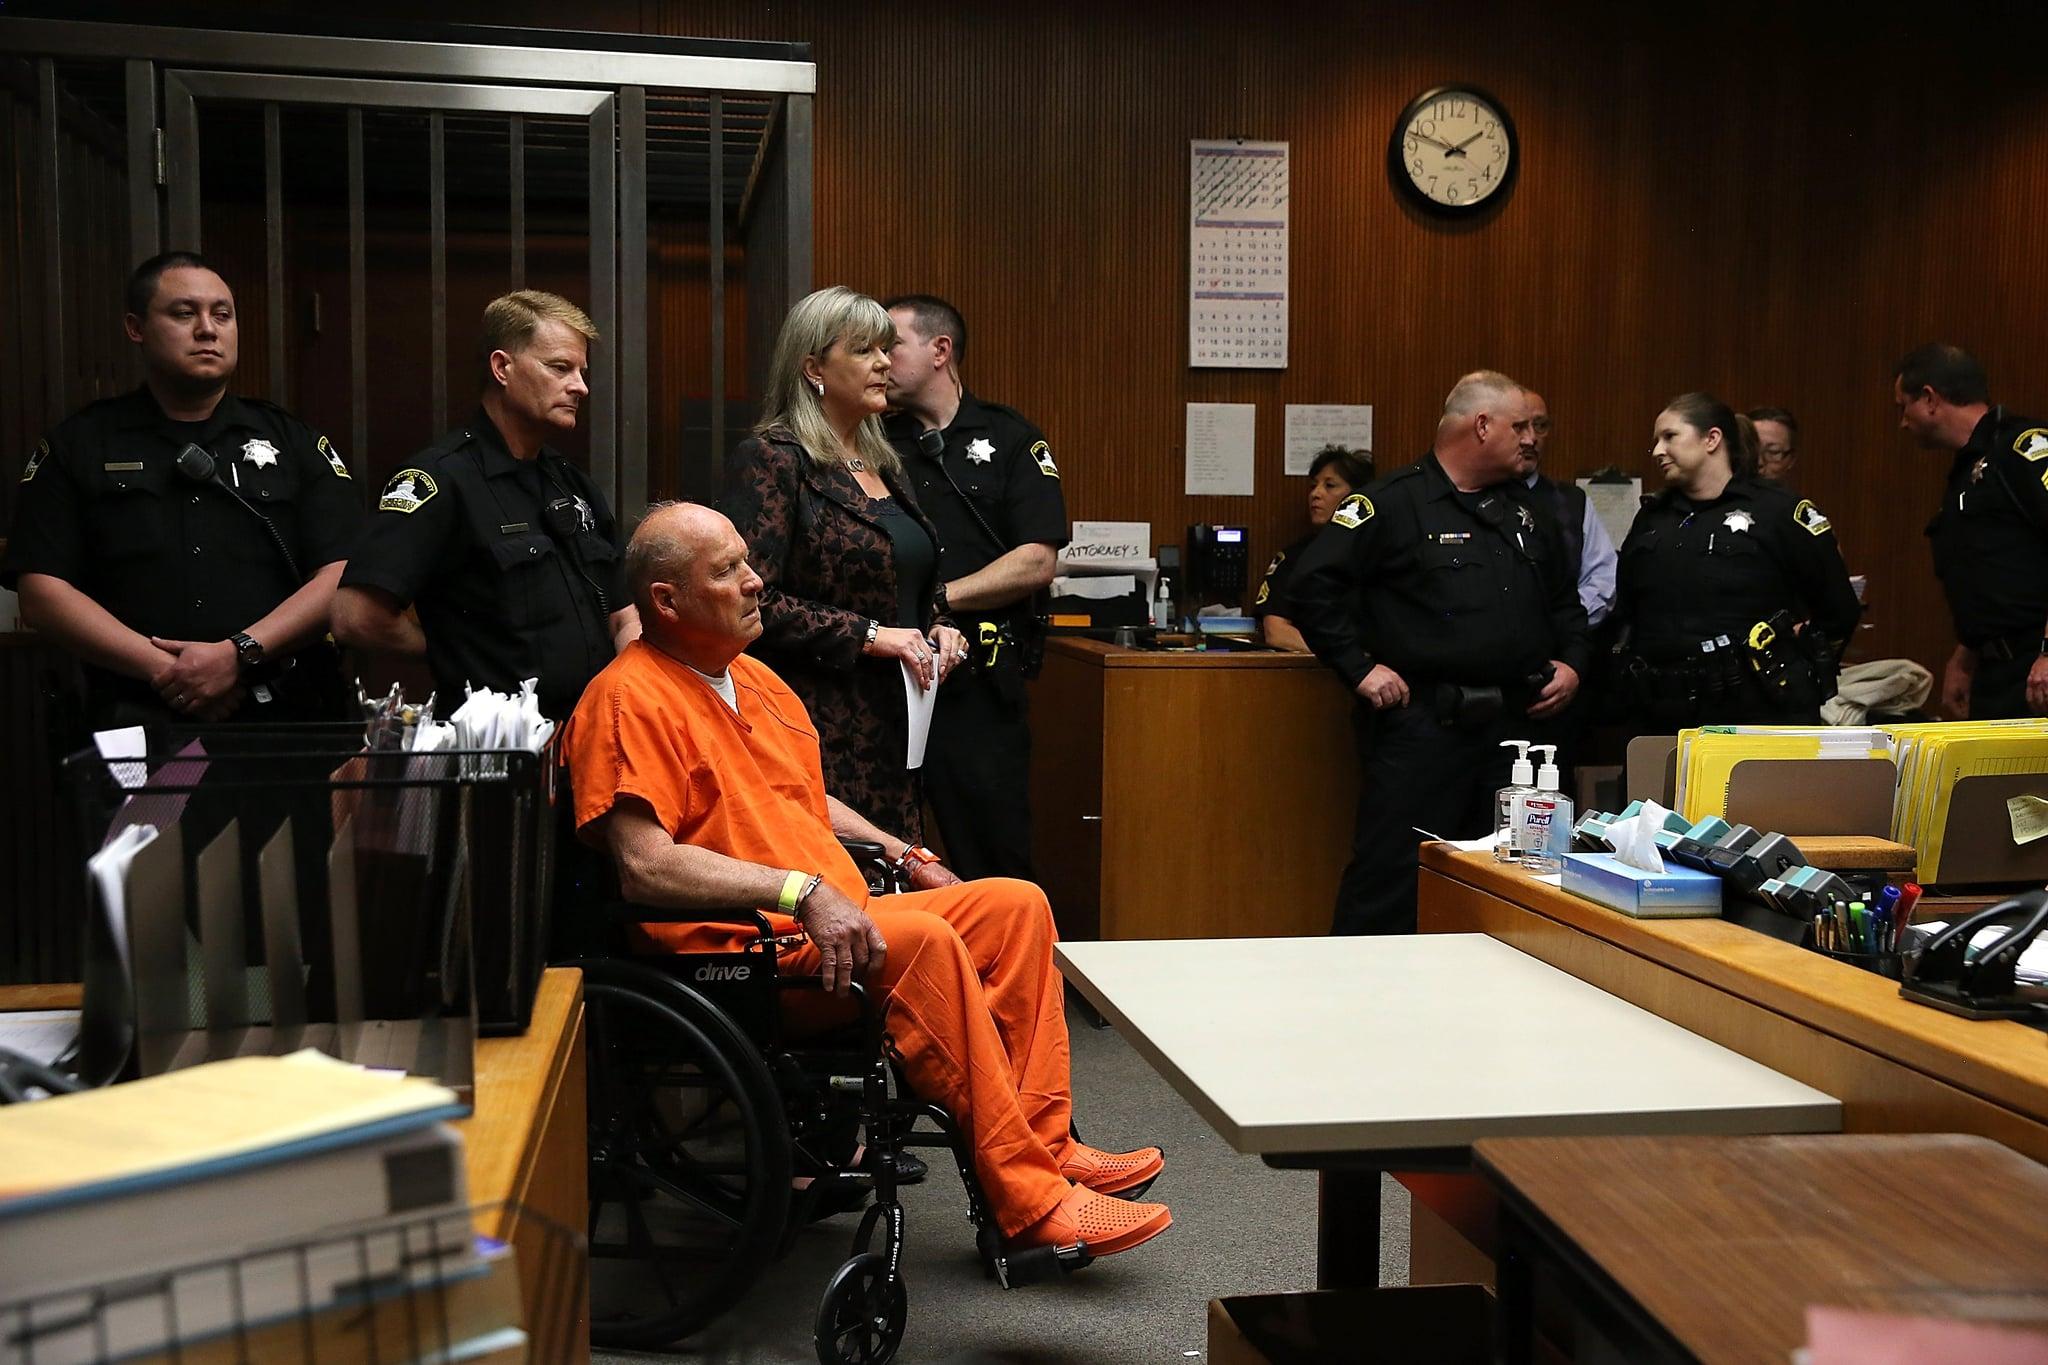 SACRAMENTO, CA - APRIL 27:  Joseph James DeAngelo, the suspected